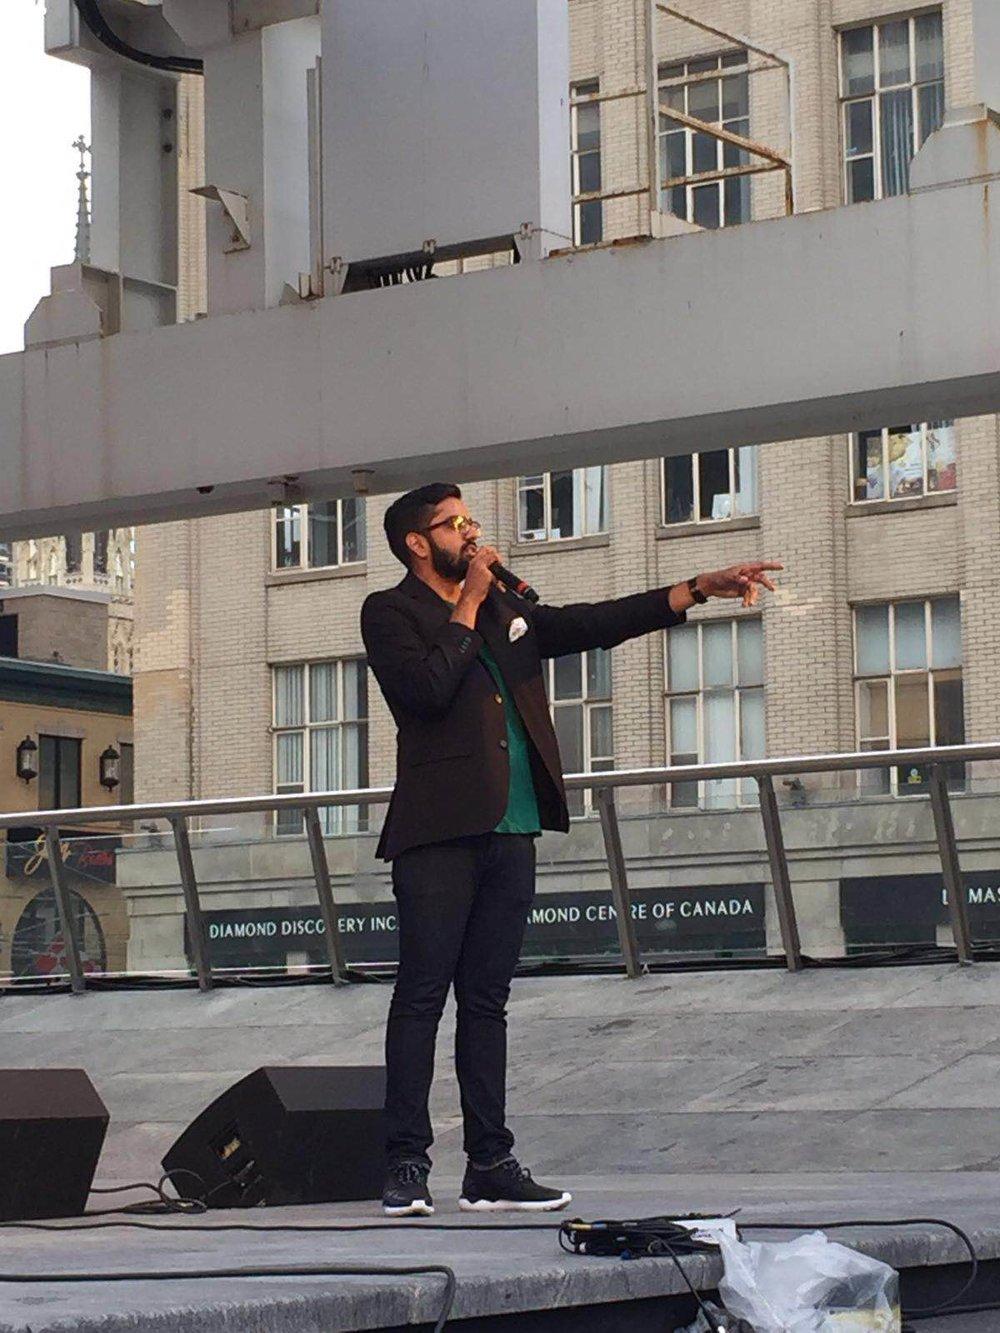 Nav emceeing DiversityFest 2016 at Yonge and Dundas Square in Toronto.